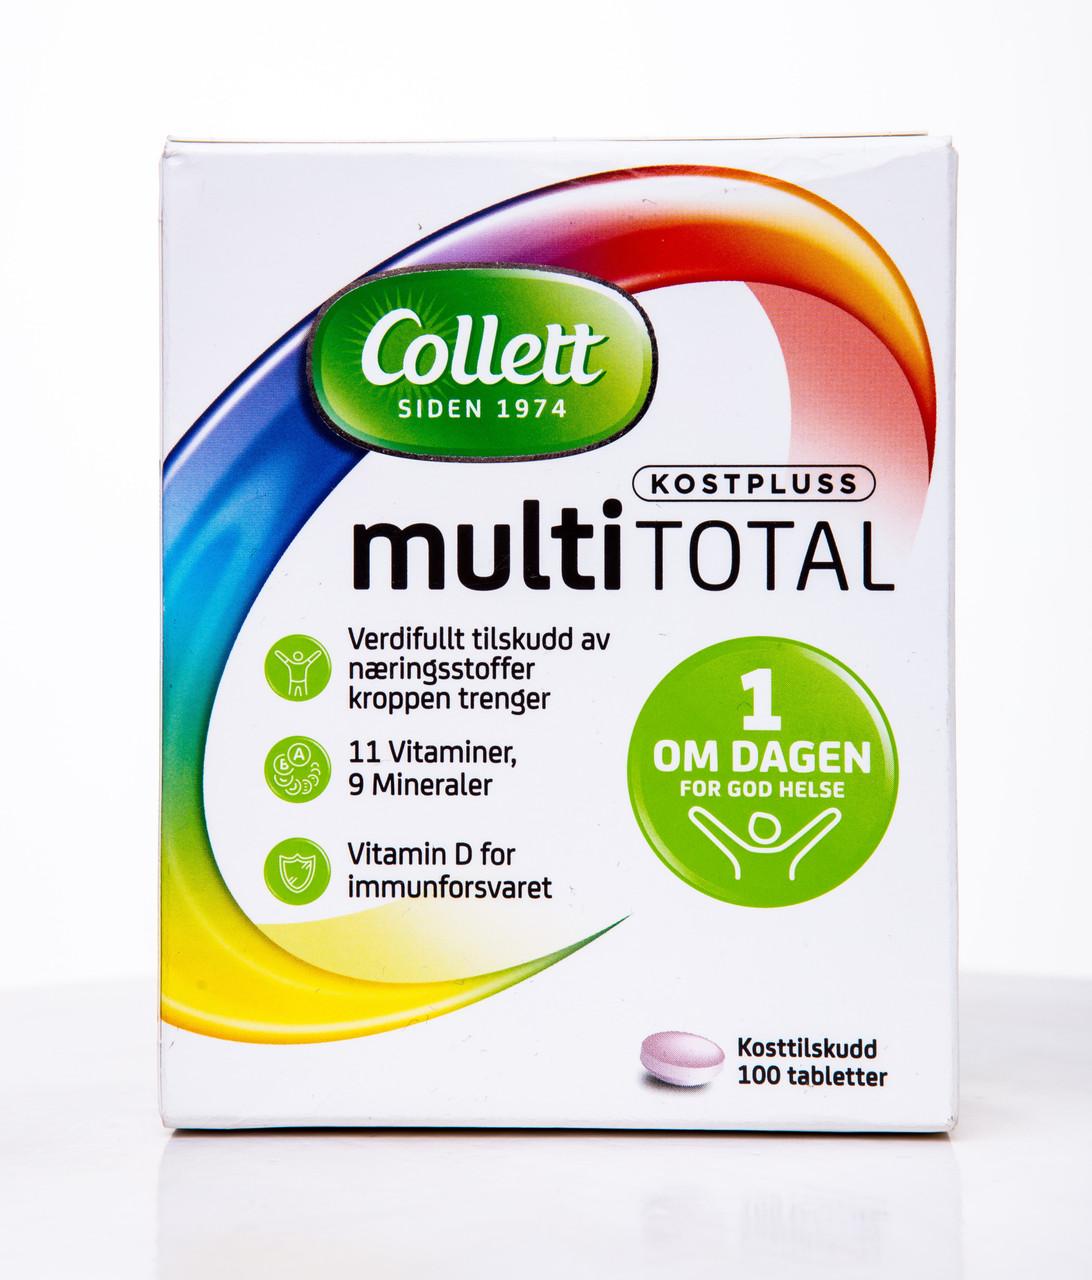 Мультивитамин Collett Multi Total 100 таблеток Норвегия